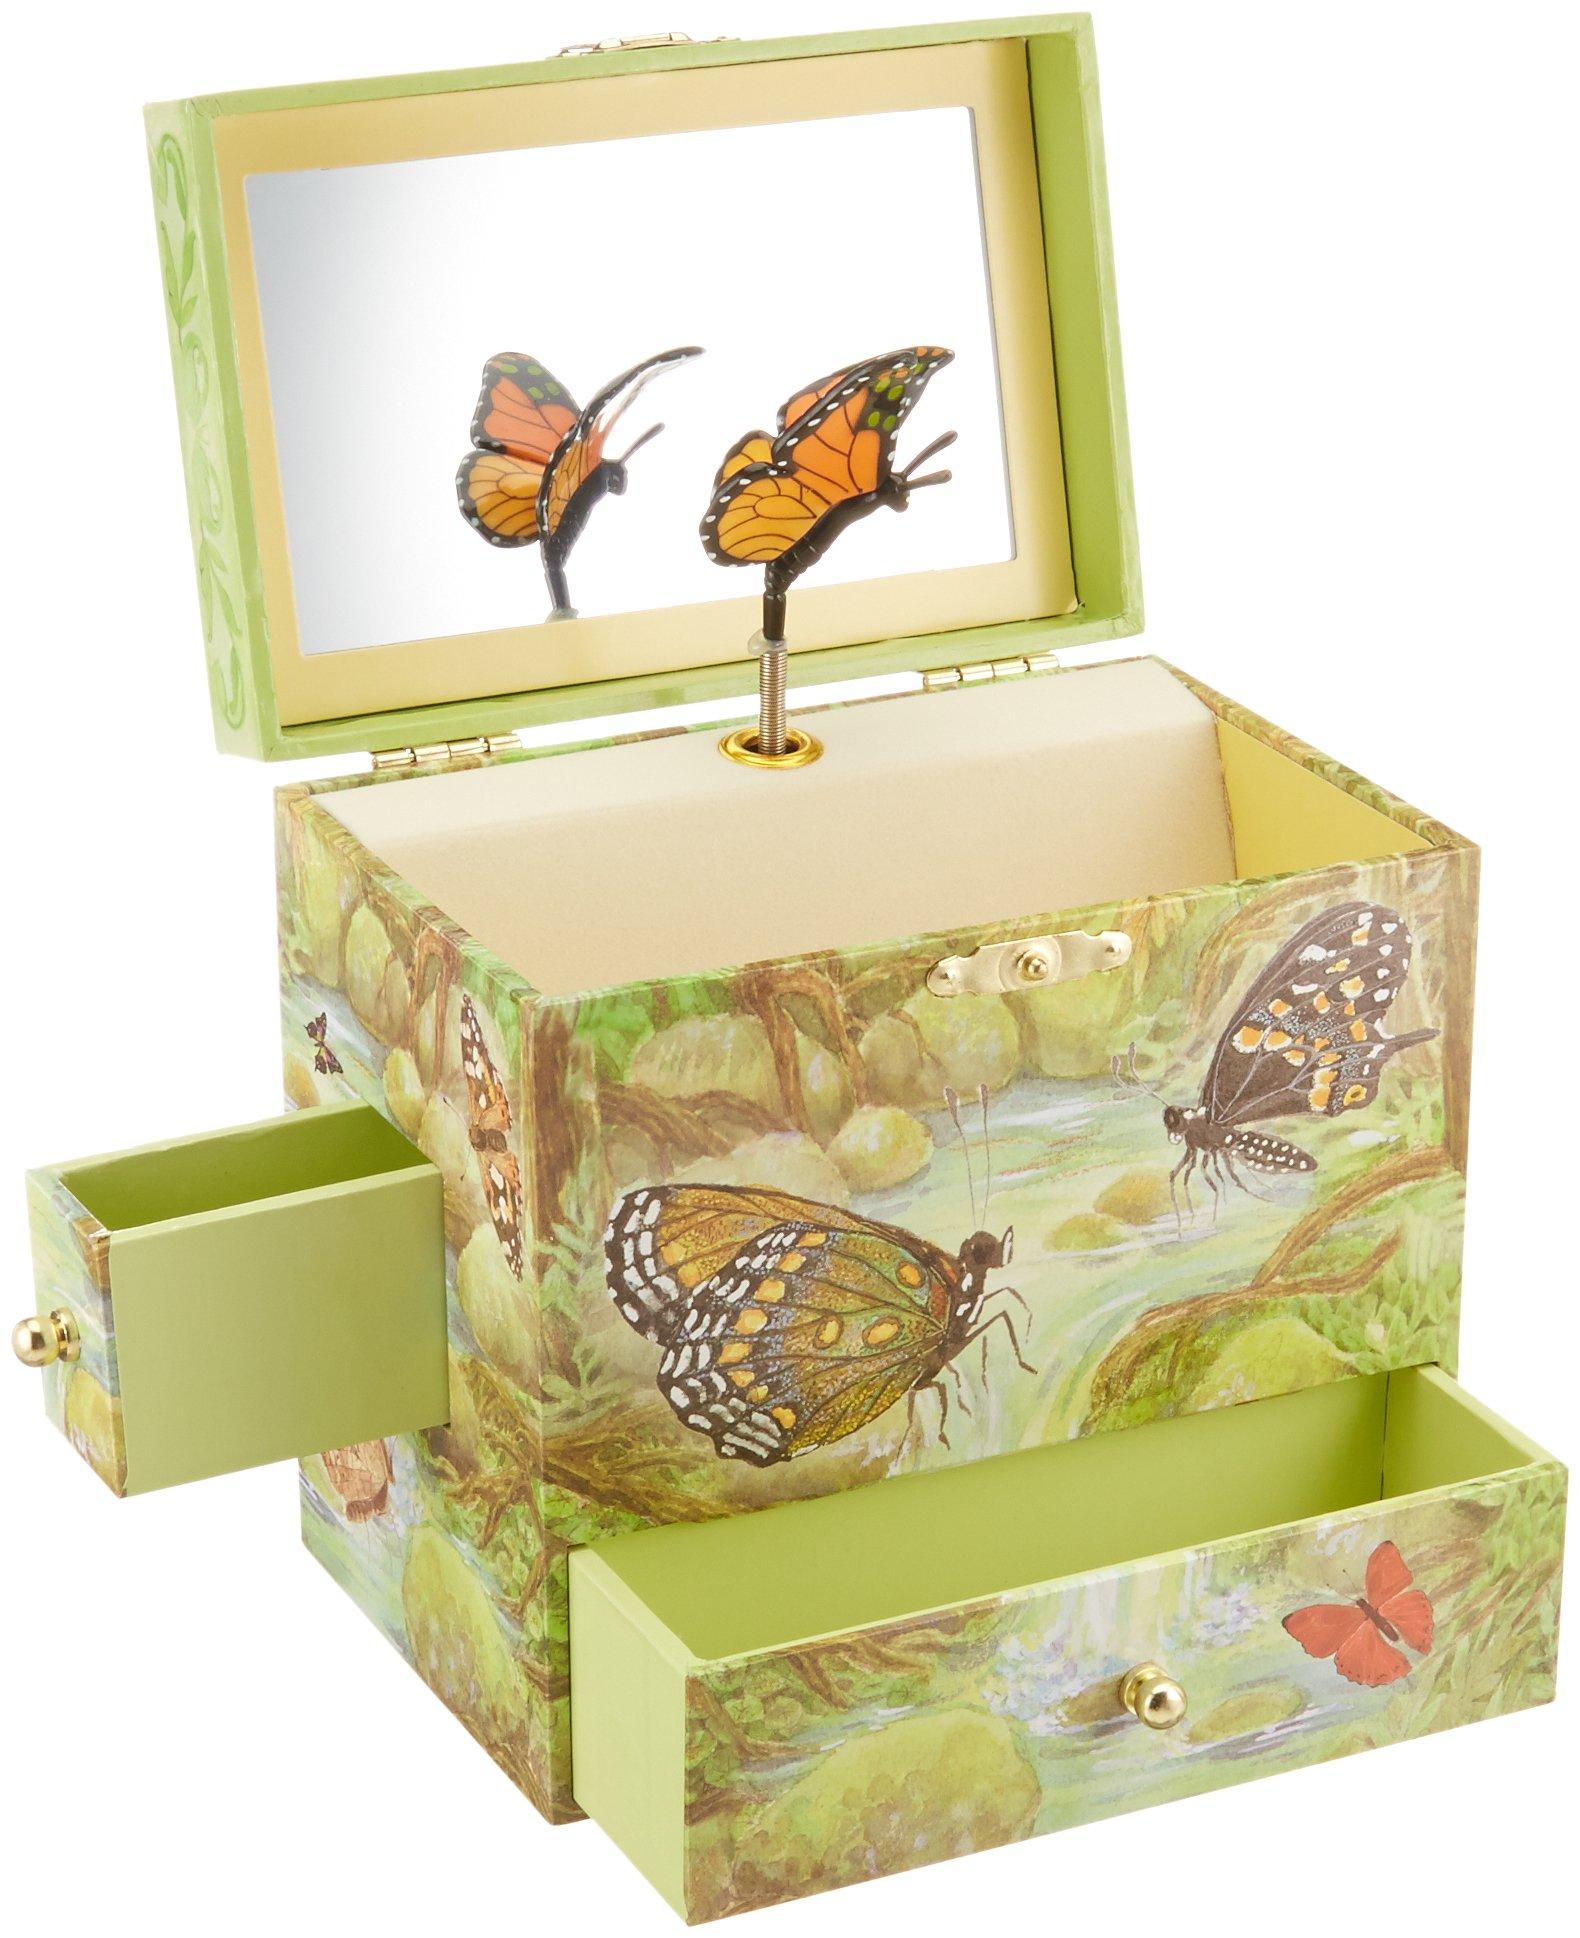 Enchantmints Monarchs Butterfly Music Jewelry Box by Enchantmints (Image #3)